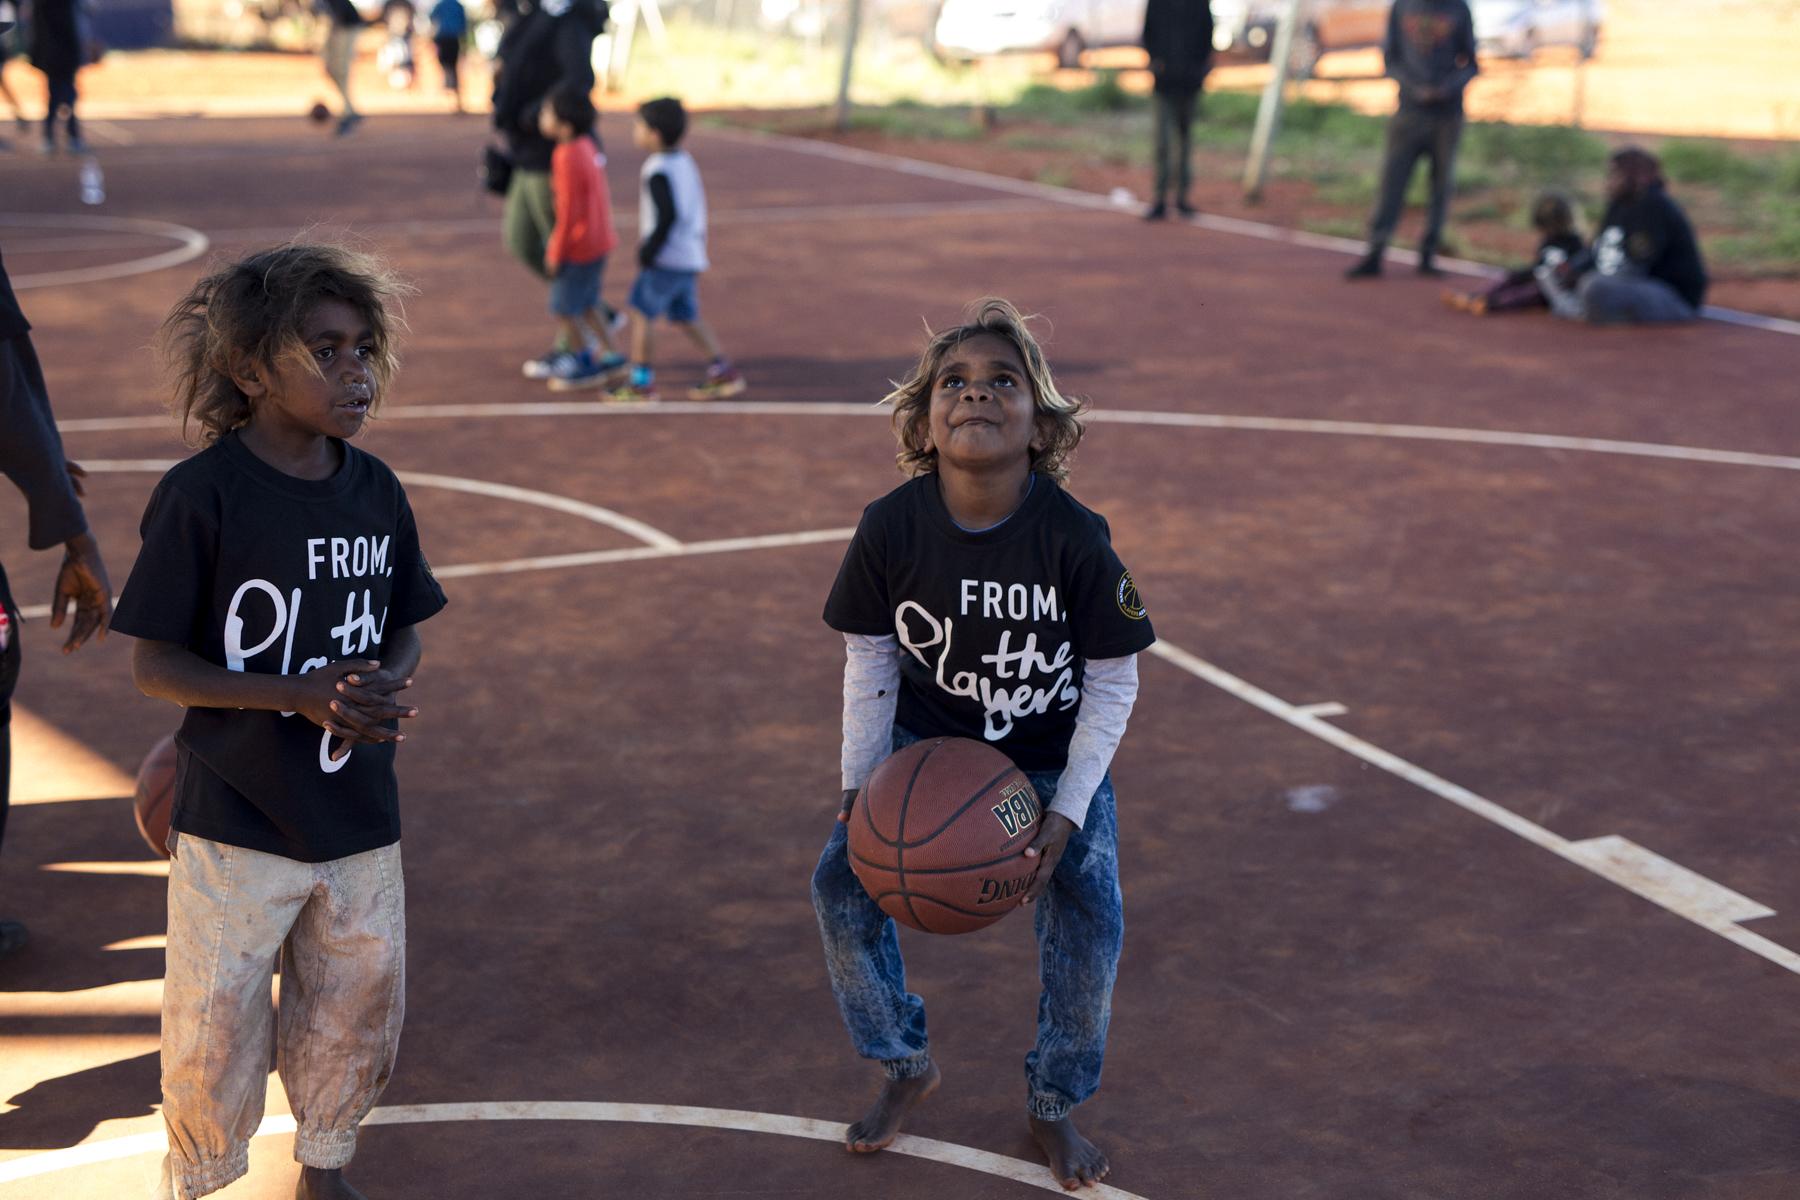 Uluru+boomers+++-30.jpg